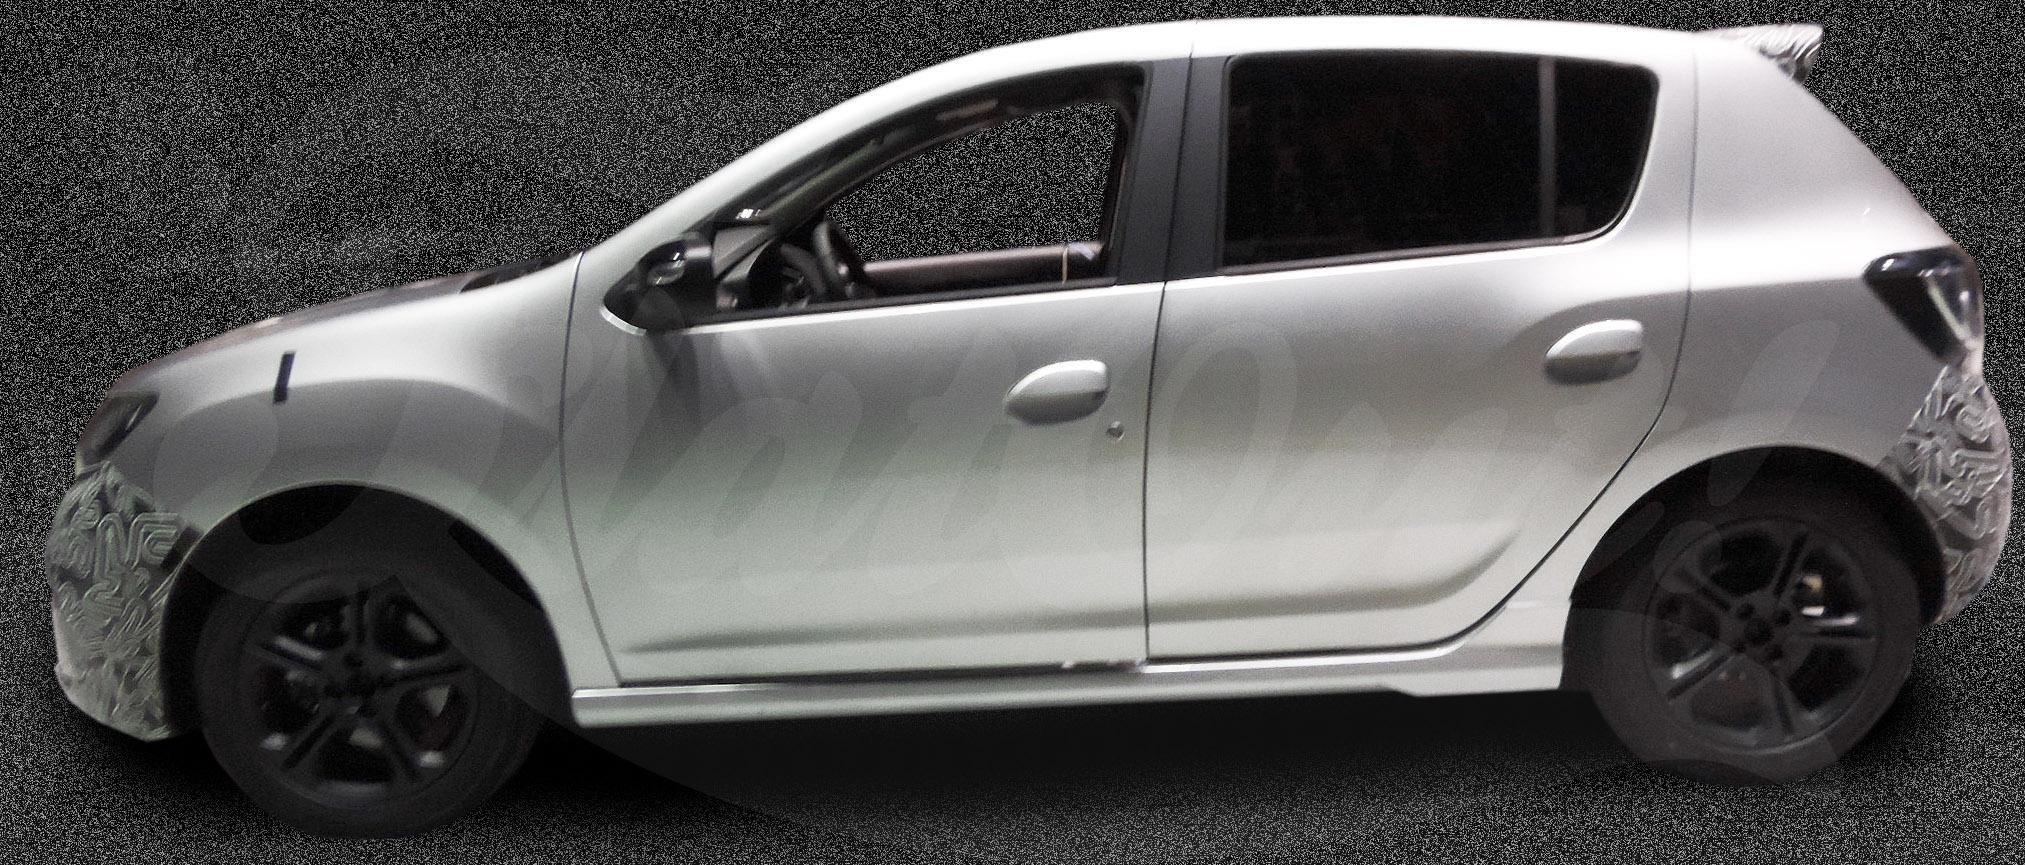 Image Result For Automotive Car Badgesa